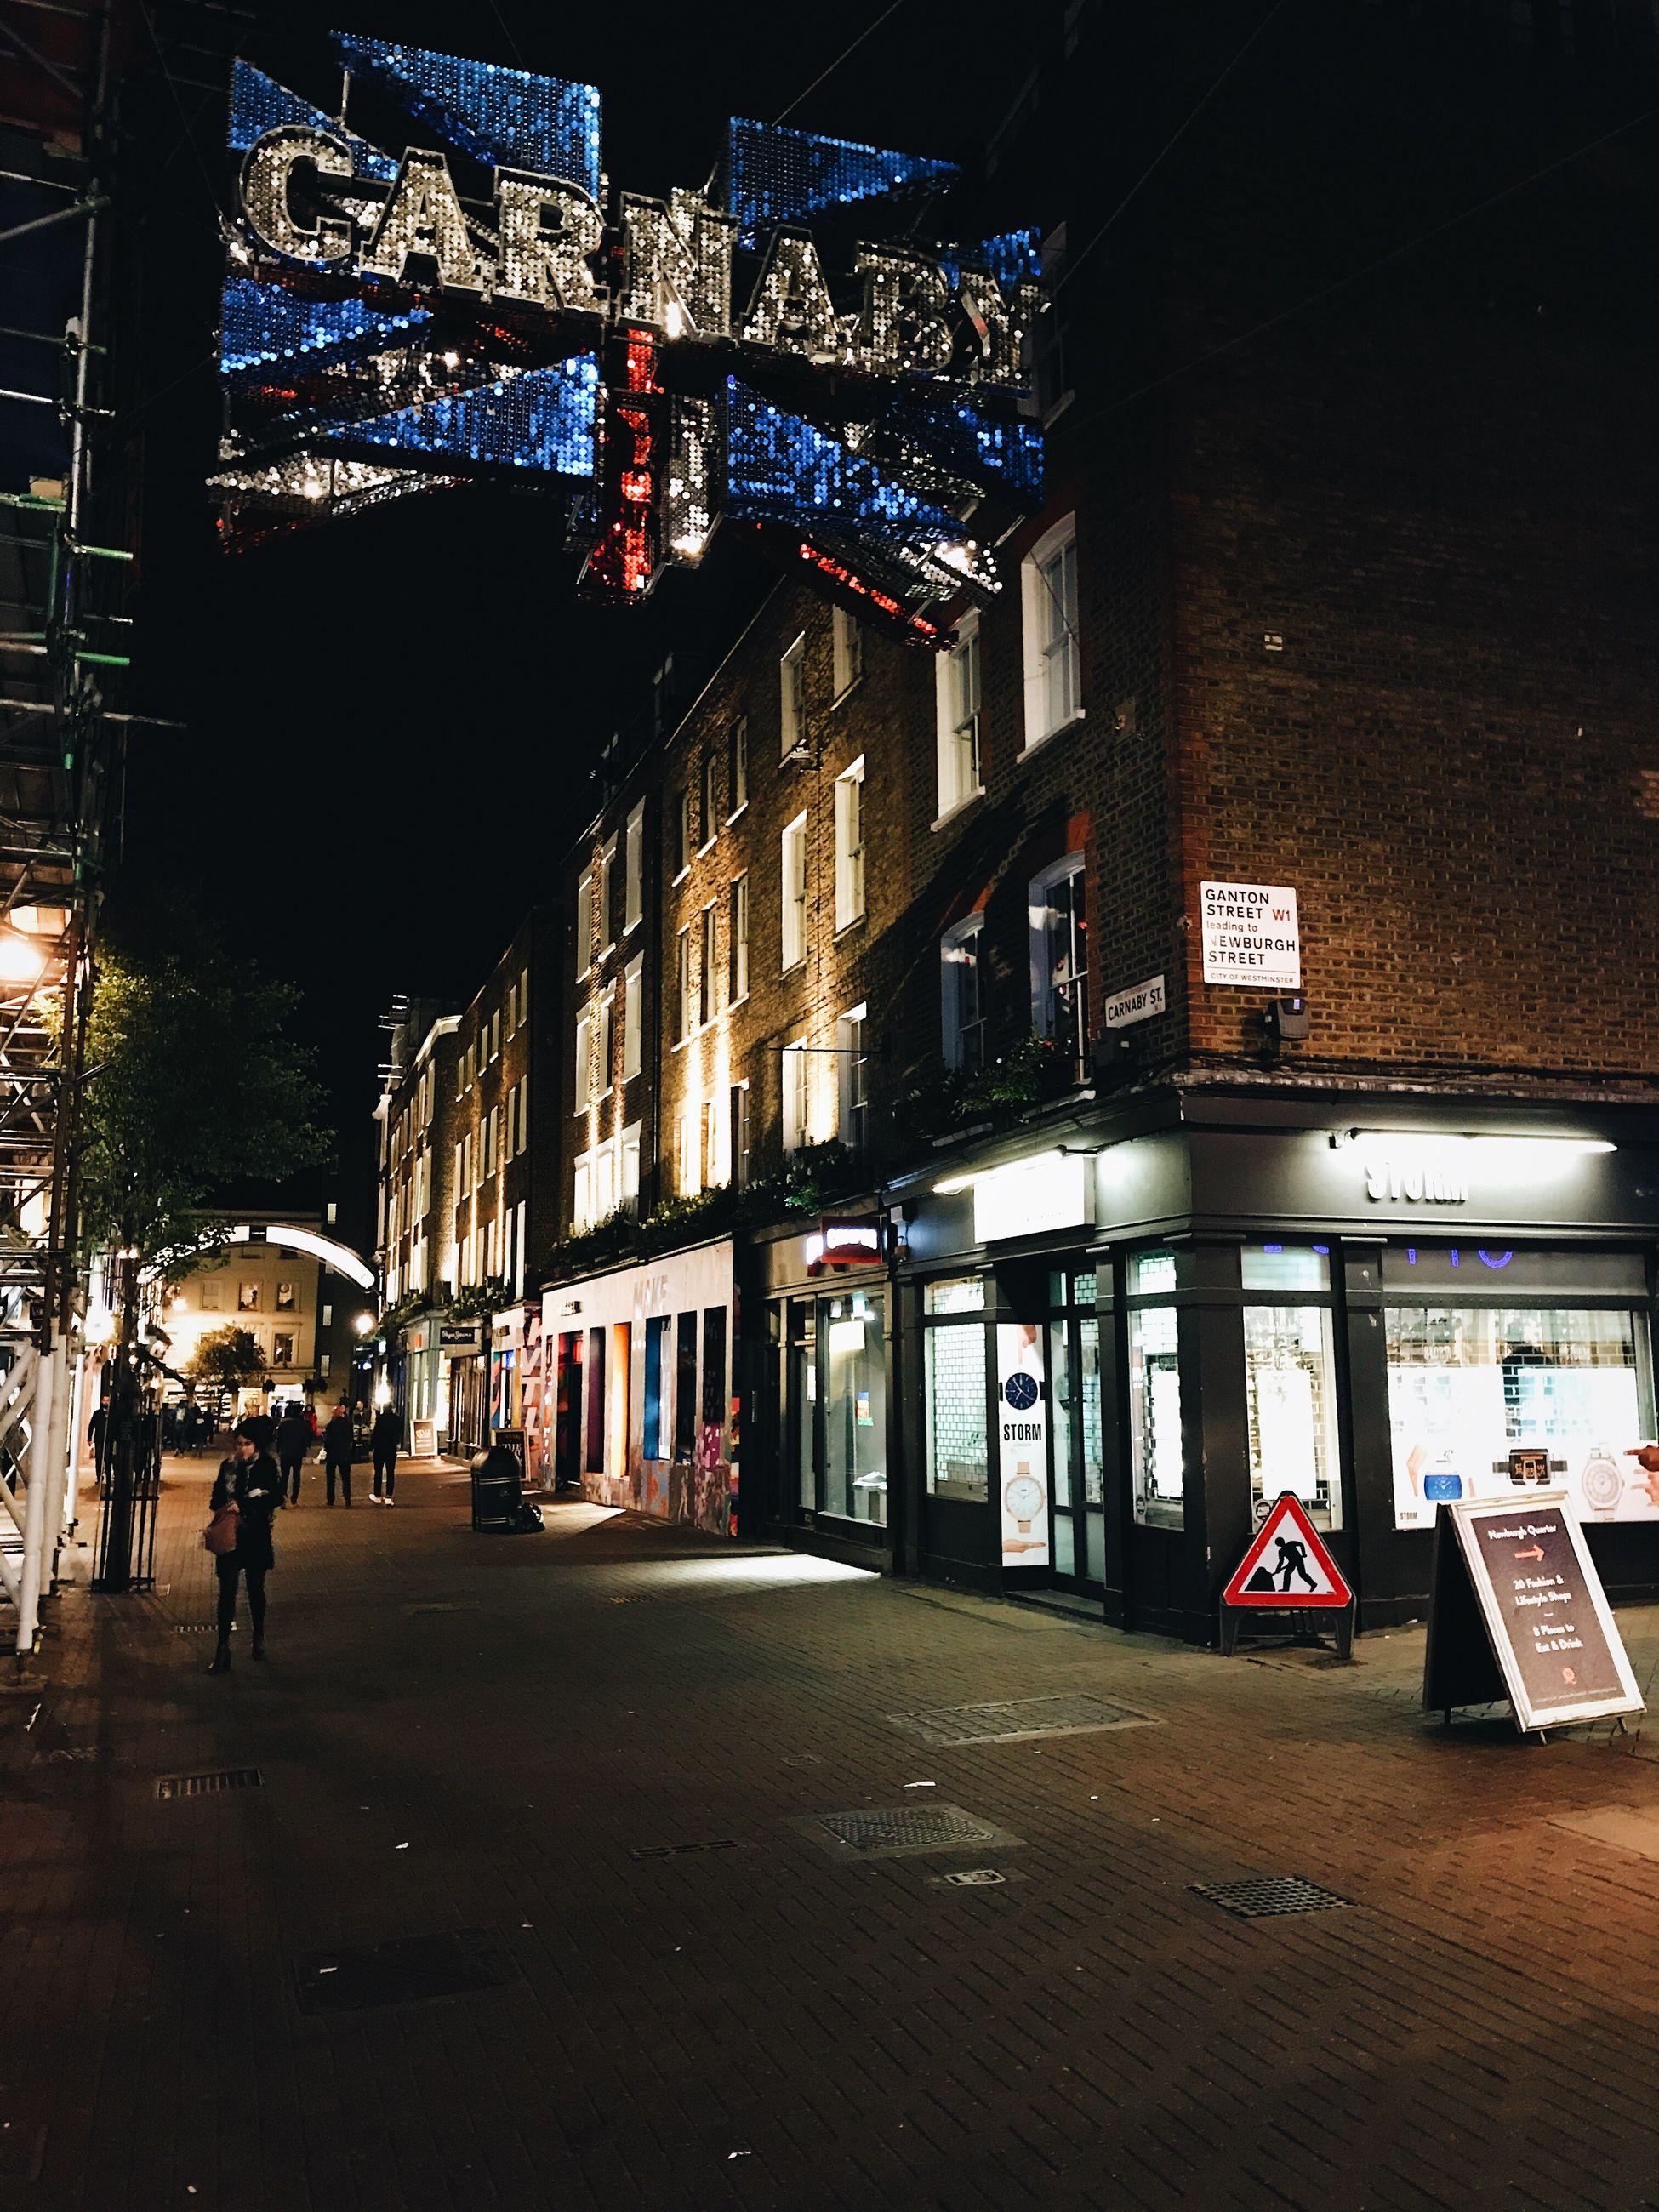 night, architecture, illuminated, city, building exterior, no people